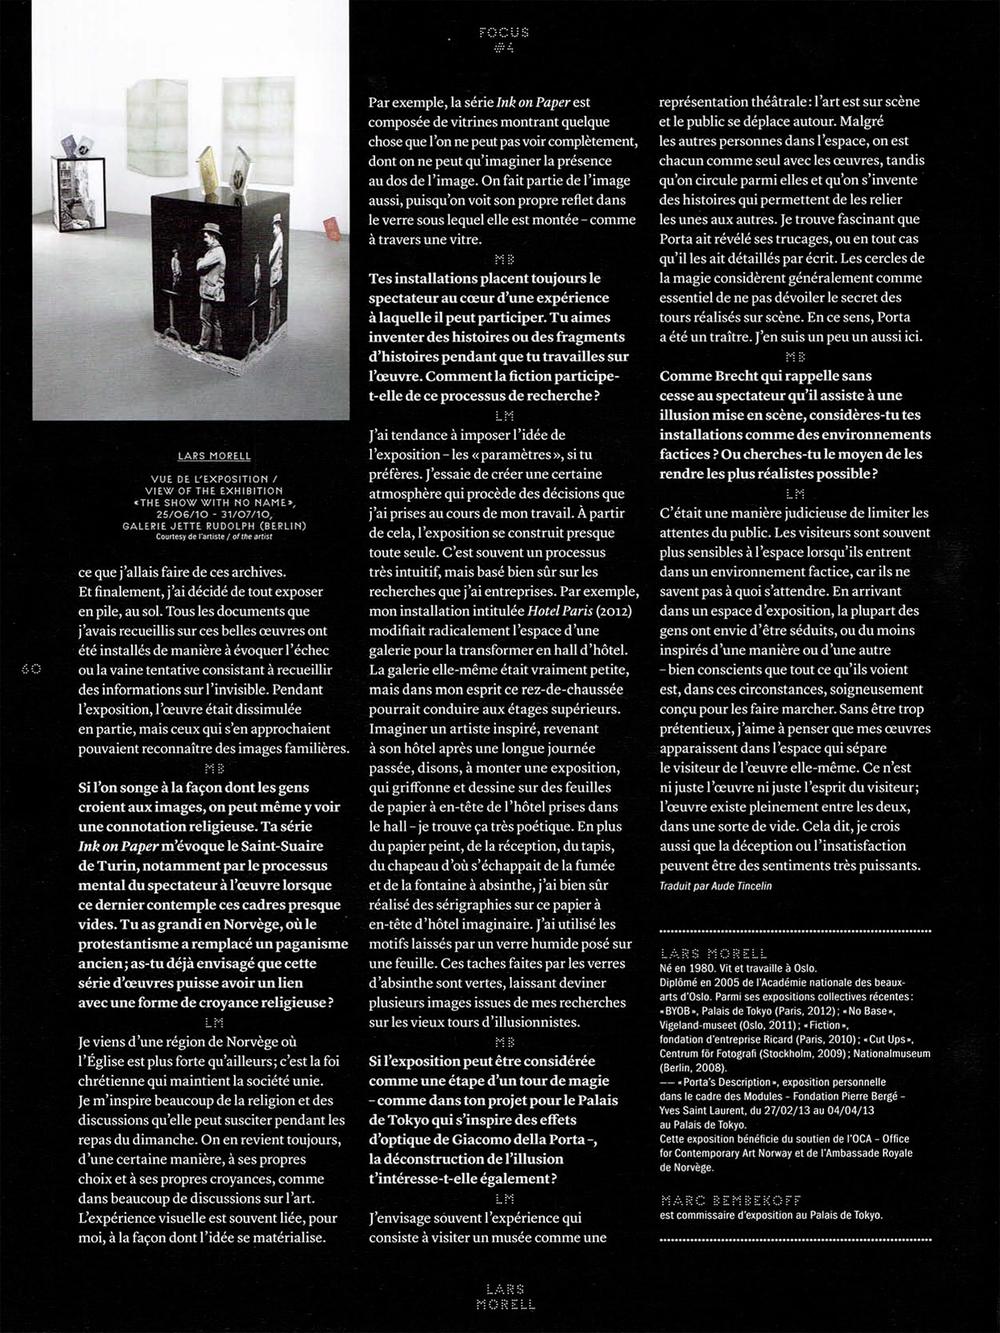 LM_Palais_Magazine_01_2013_-2.jpg